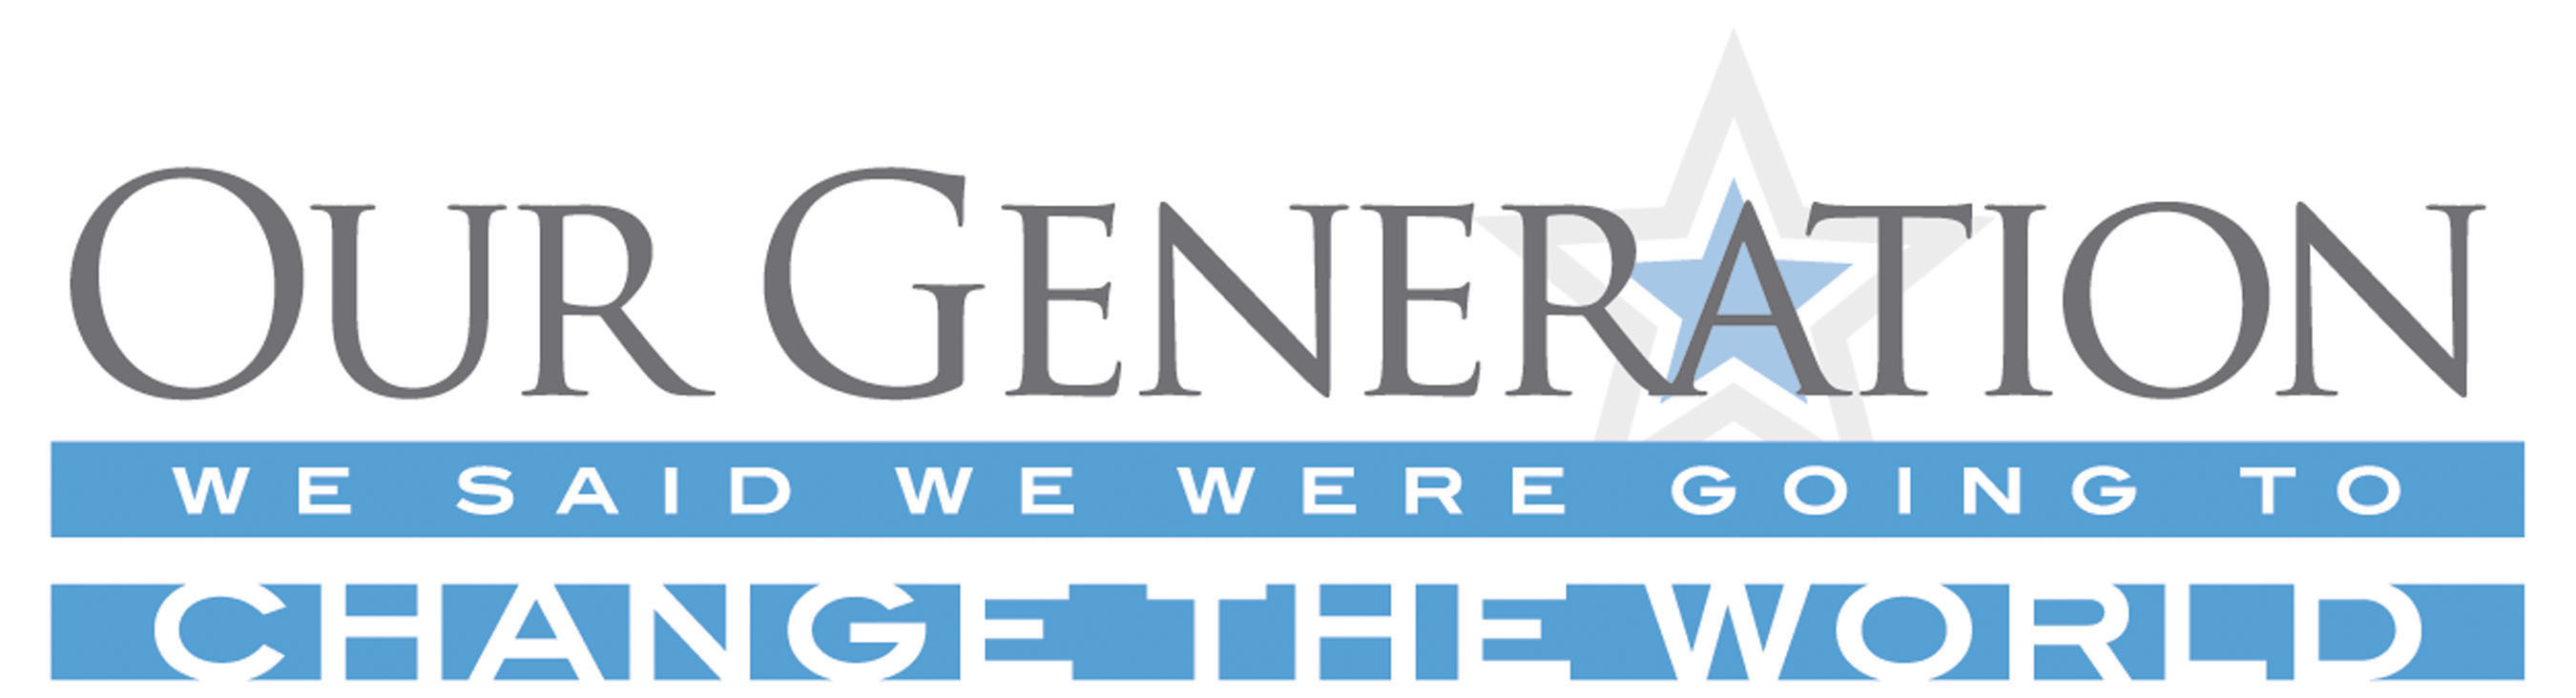 OUR GENERATION. (PRNewsFoto/Our Generation) (PRNewsFoto/)